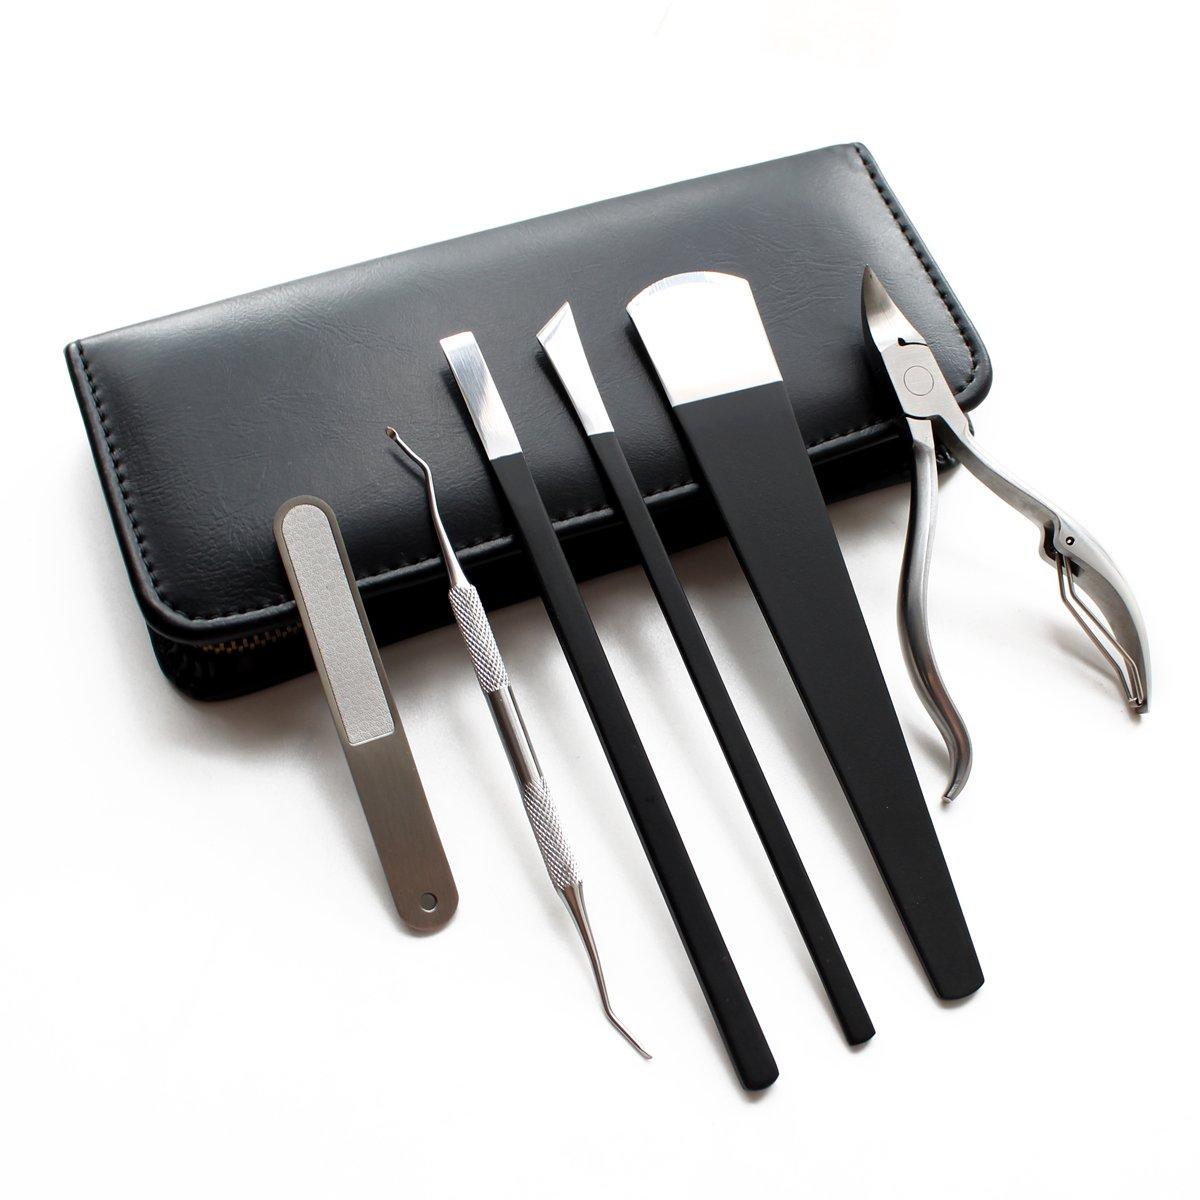 Stainless Steel Pedicure Tools Kit, Professional Manicure Set, Pedicure Knife Kit, Utility Nail Care Set (6 Pcs)